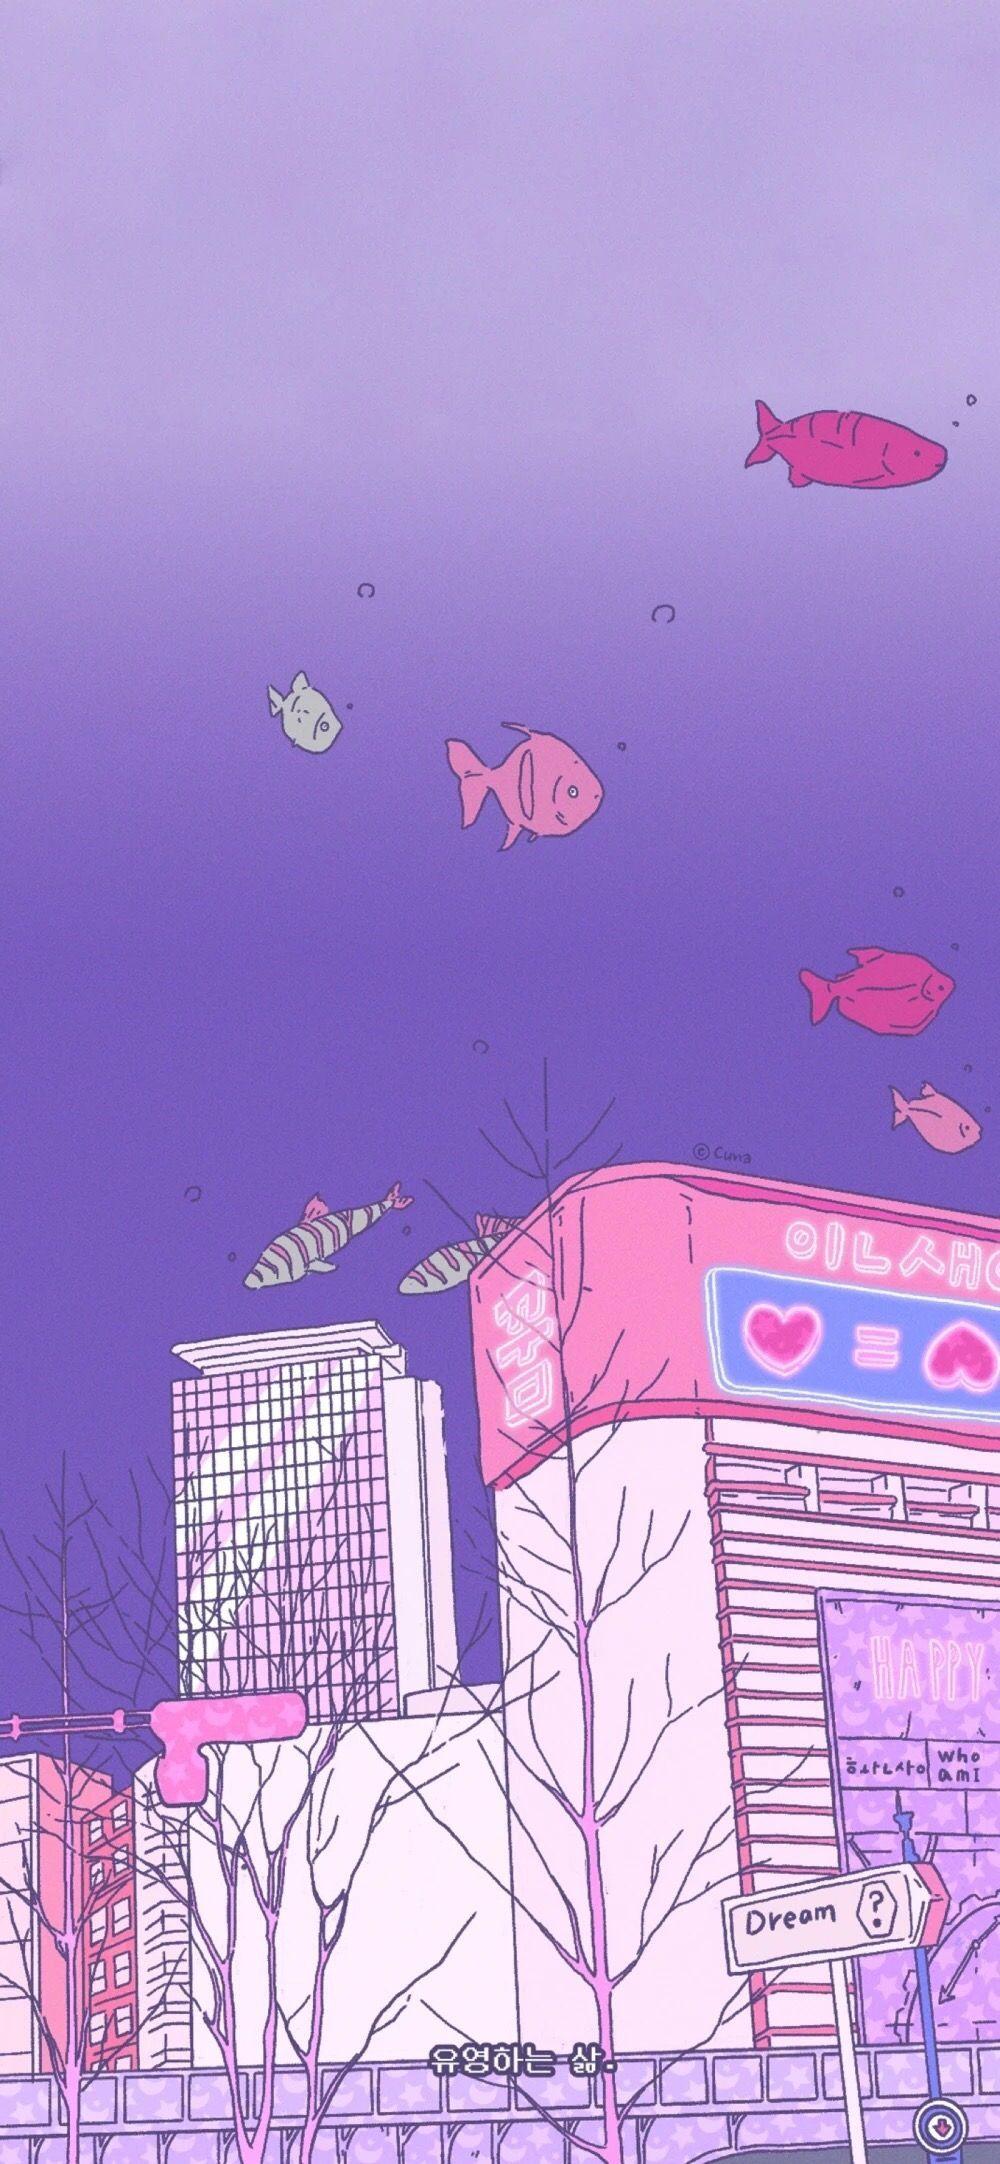 Pin Oleh Mieseyo Di Aesthetic Background Wallpaper Wallpaper Ungu Ilustrasi Lucu Gambar Dinding Anime wallpaper hd ungu